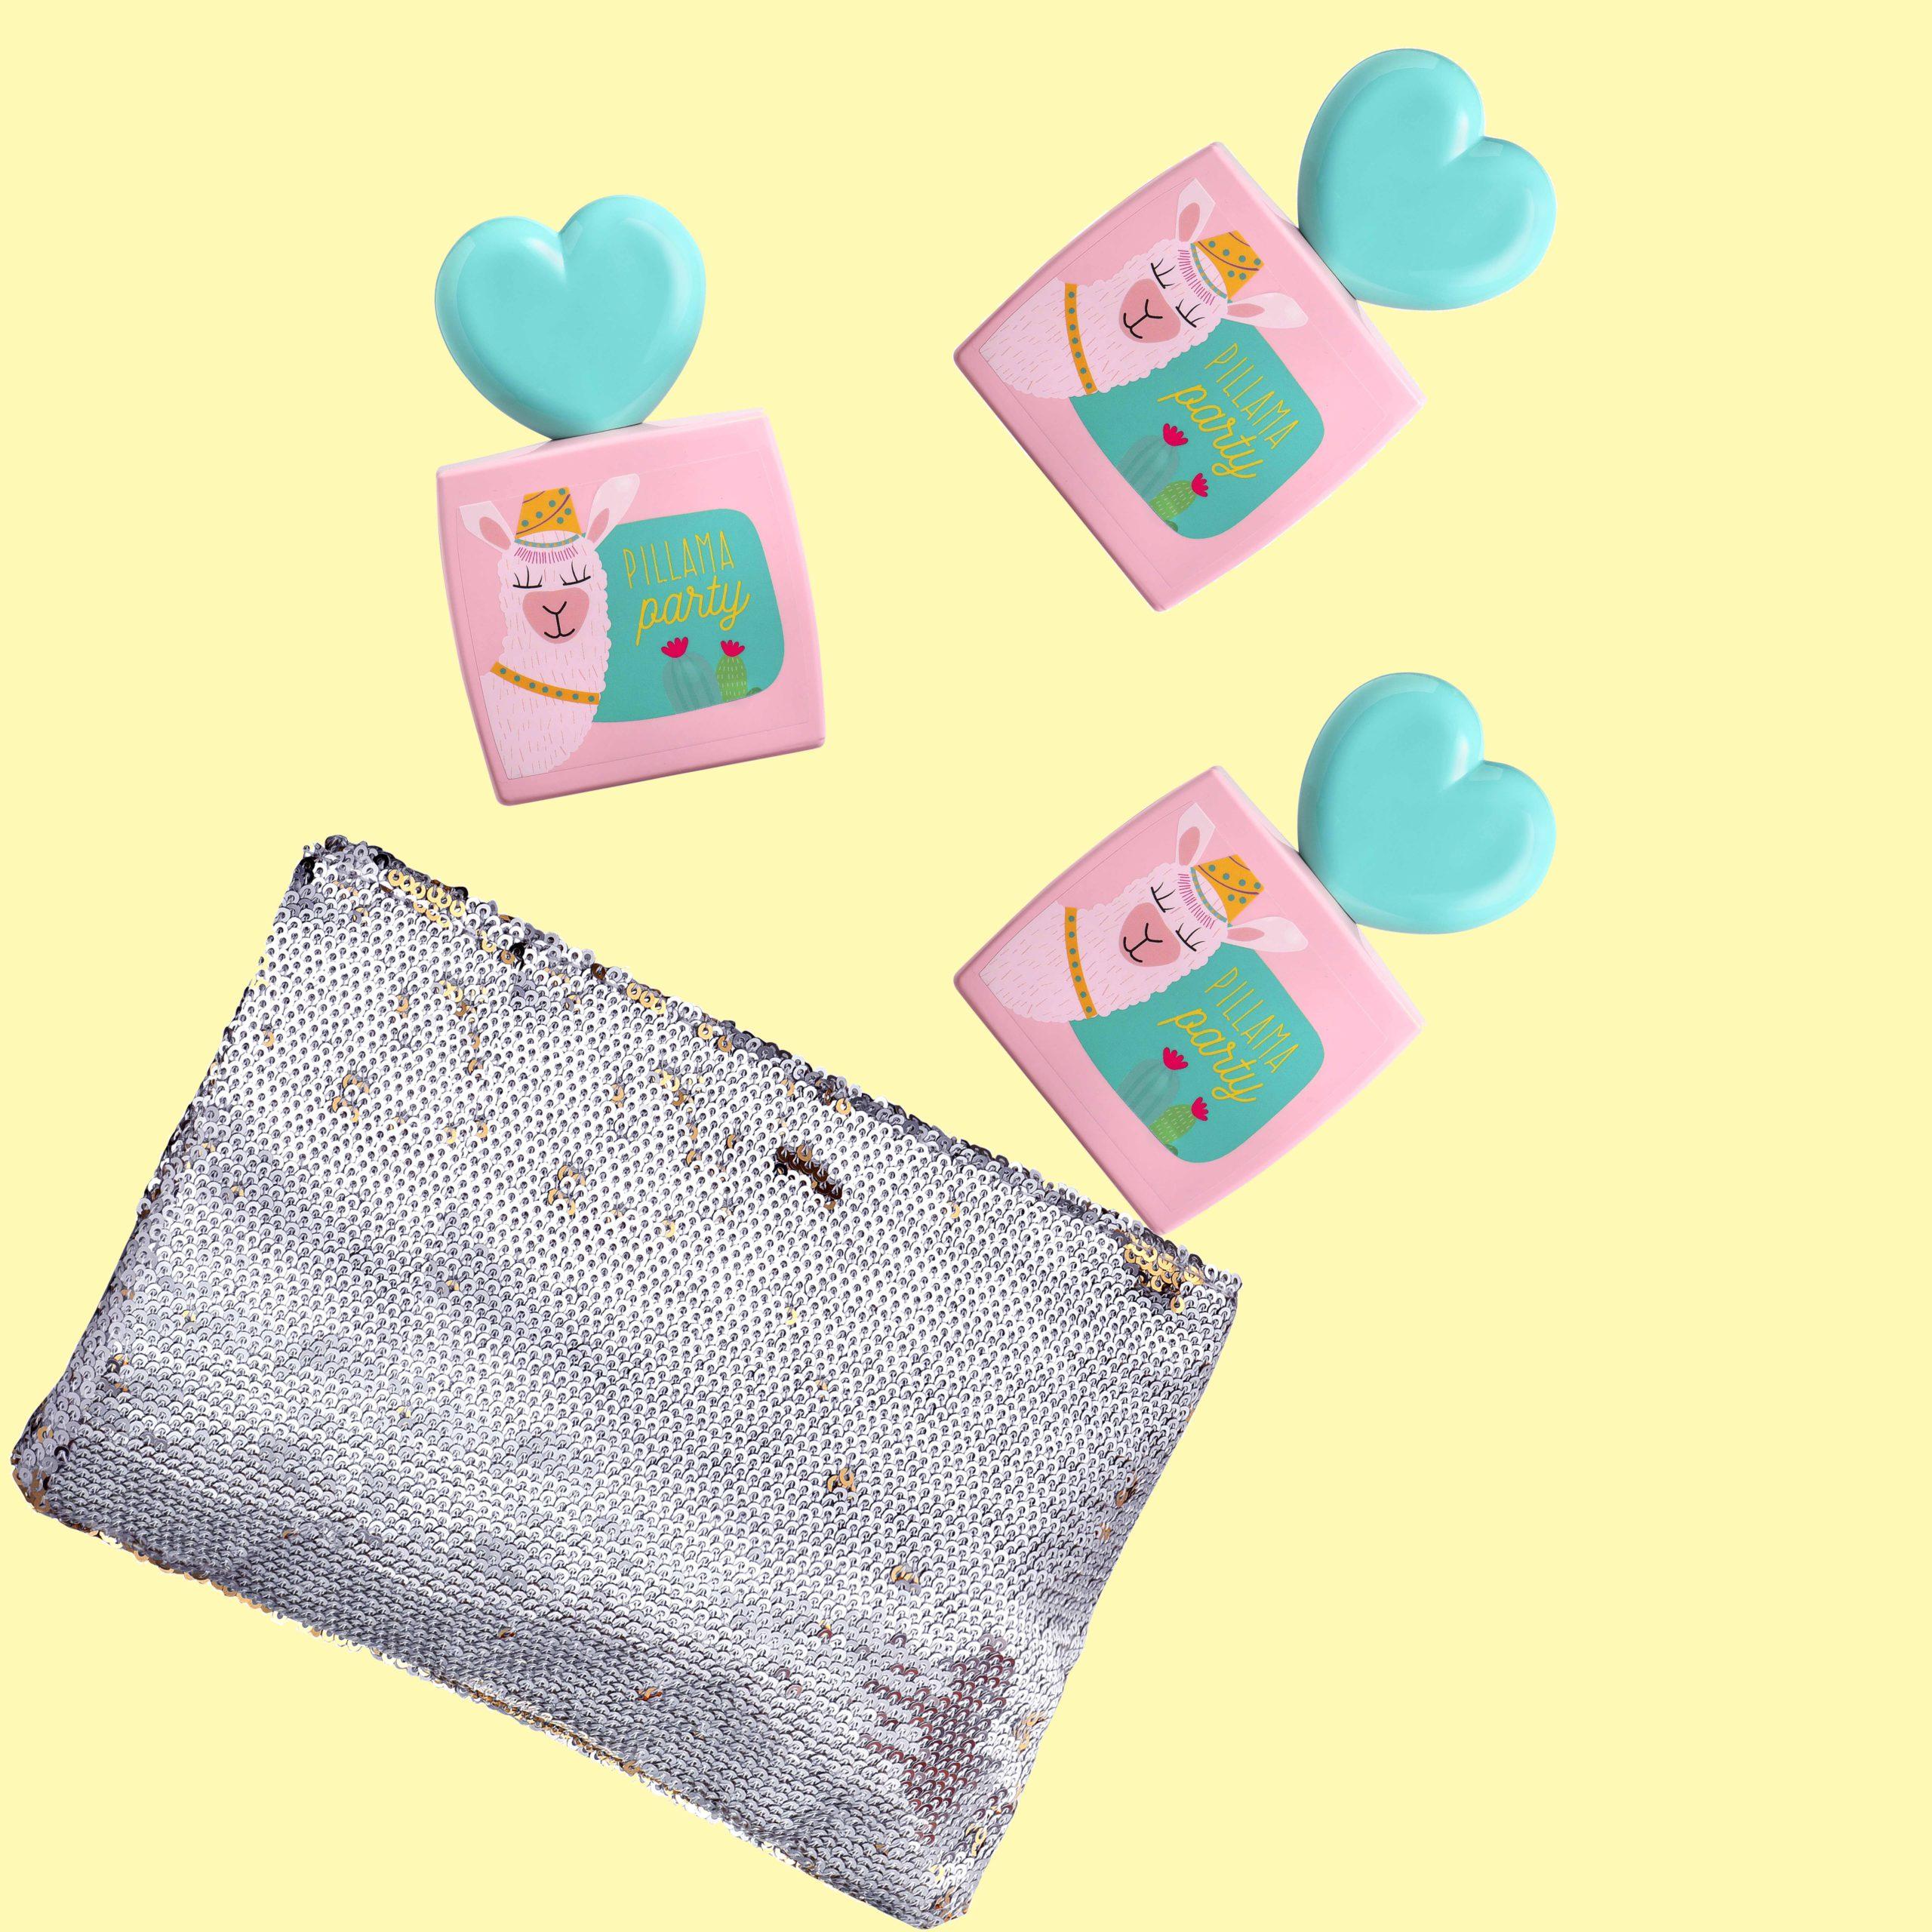 """Pillama Party"" Gift Set with EDT & Toilet Bag"